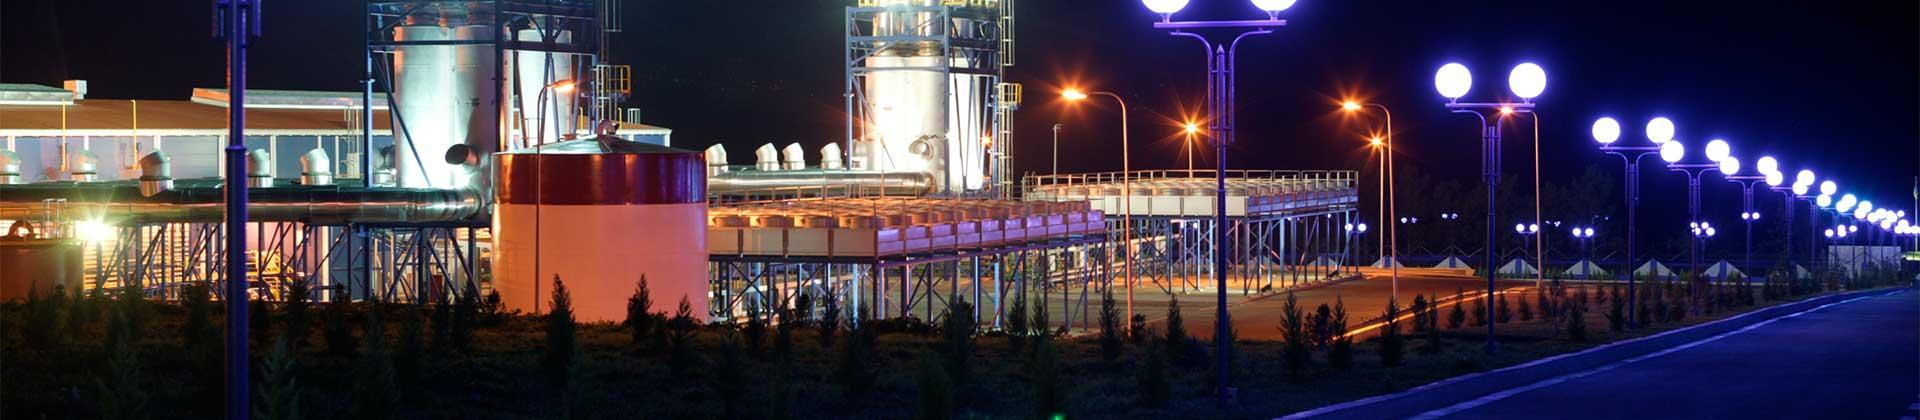 Sheki power plant 2